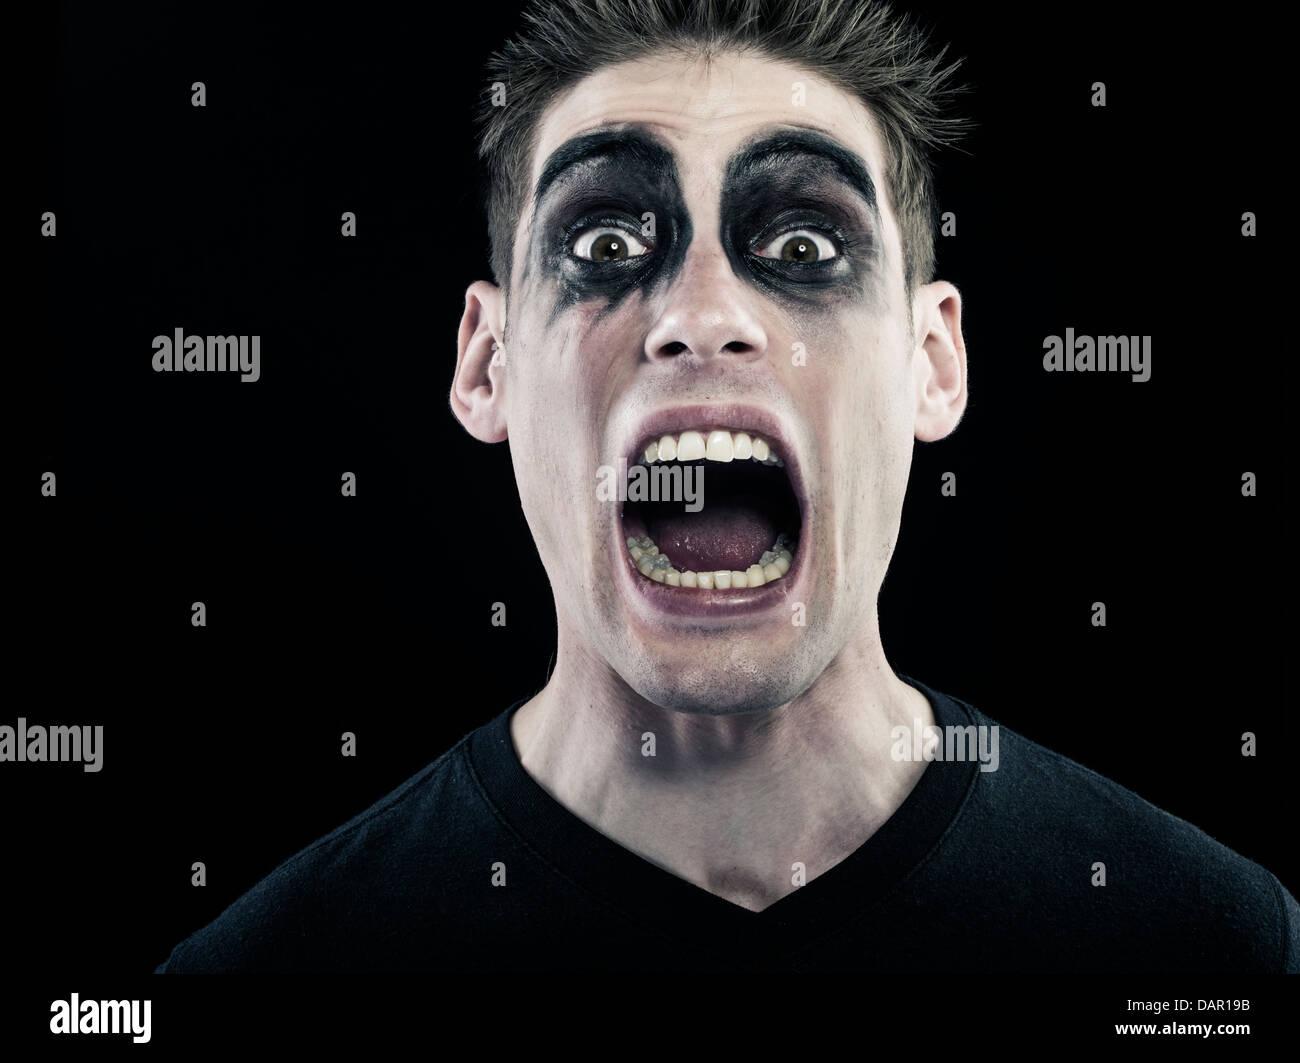 Scary man screaming - Stock Image